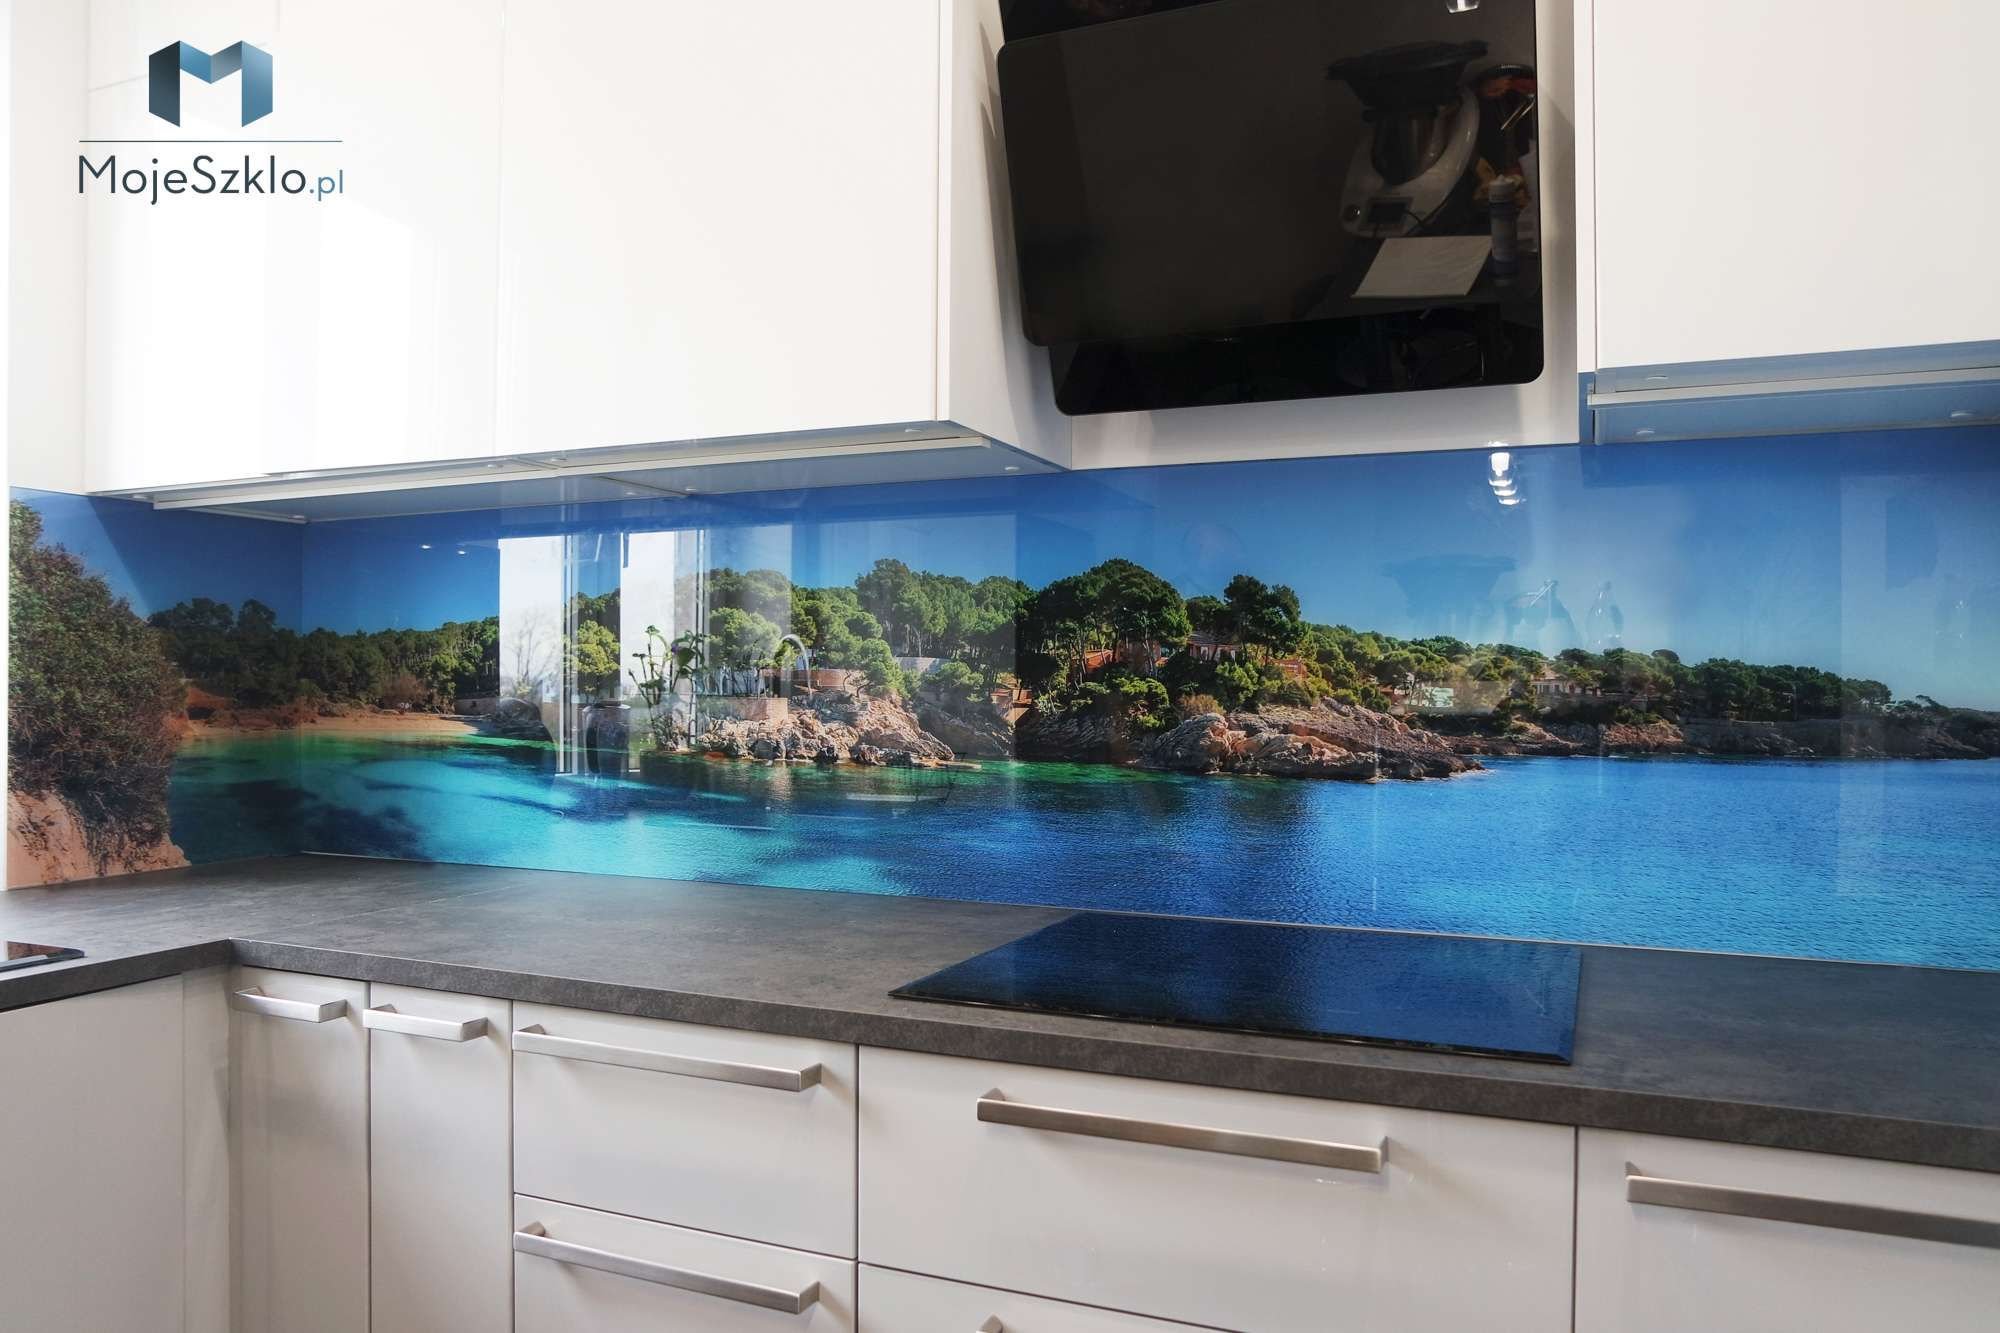 Panel Szklany Kuchnia Wybrzeze - Panel szklany plaża, krajobraz morski